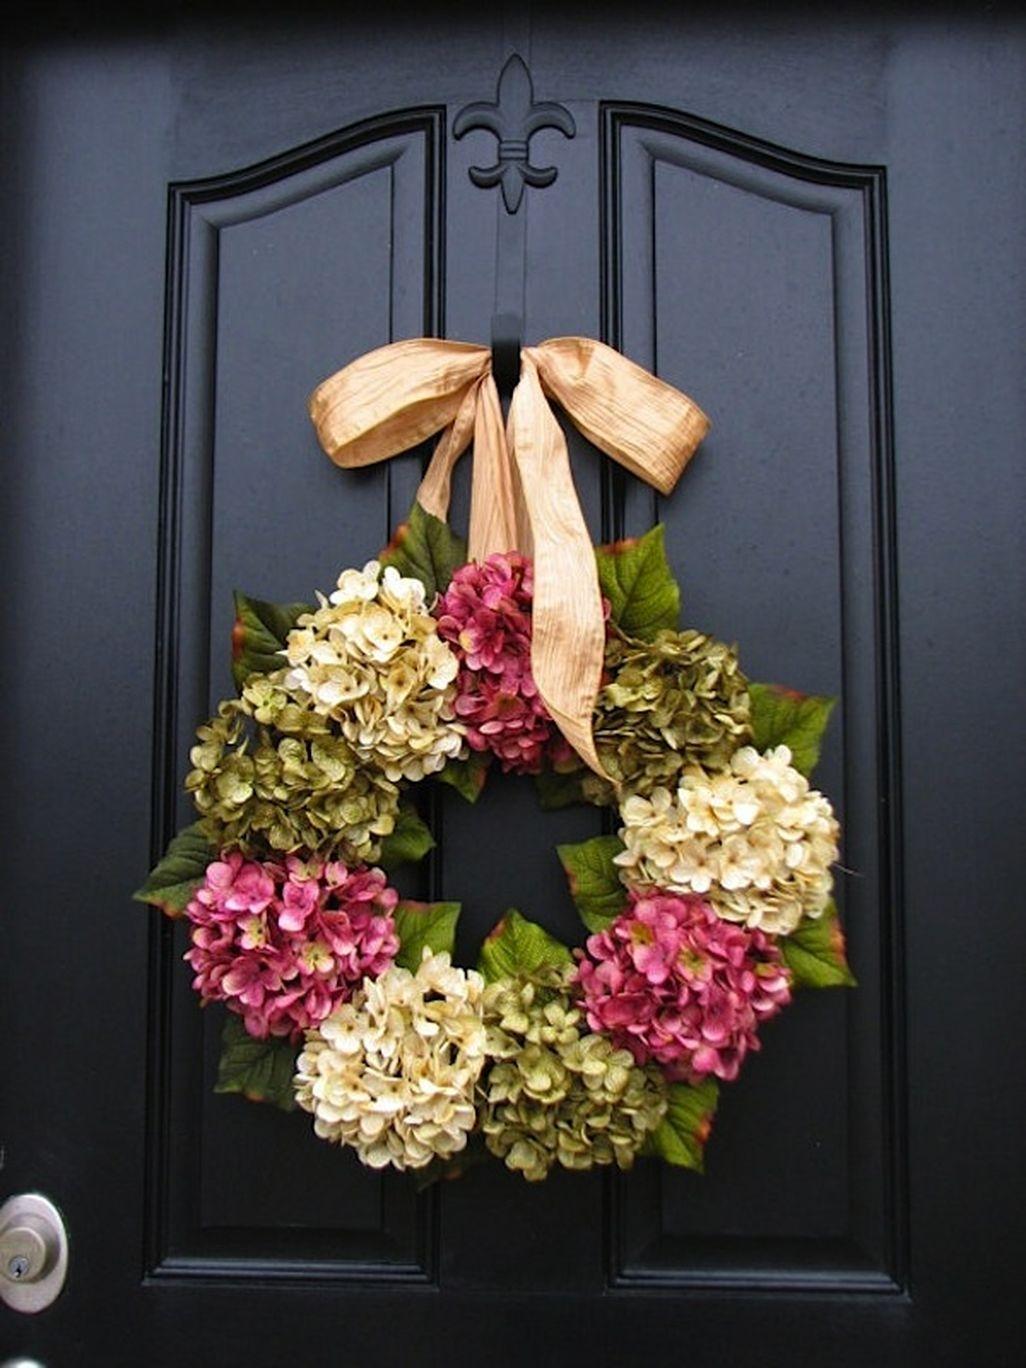 Easy Diy Spring And Summer Home Decor Ideas 39